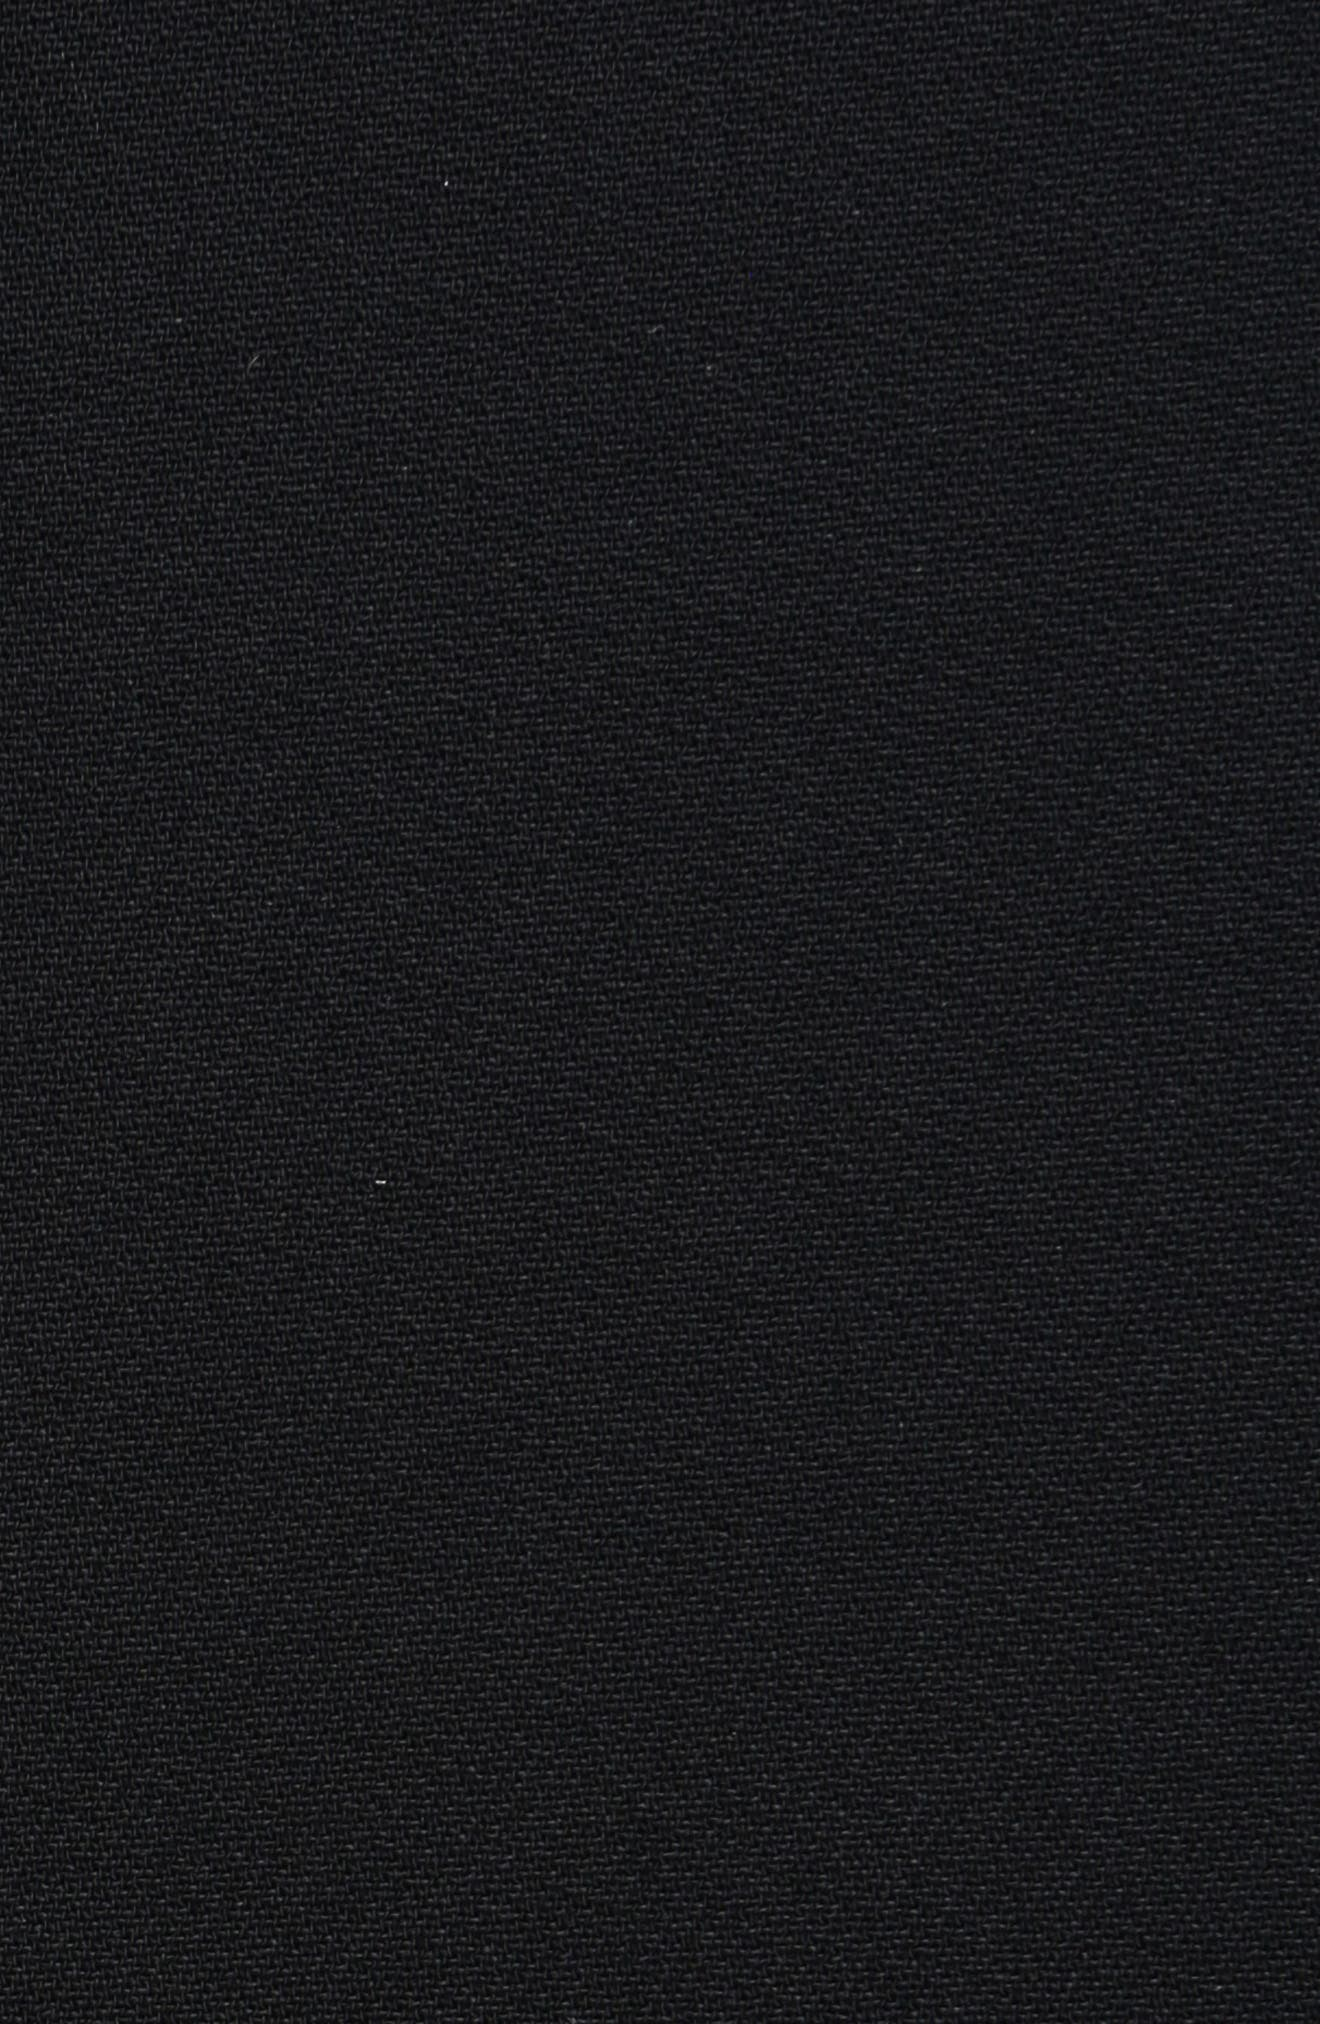 Alternate Image 3  - Givenchy Lace Trim Stretch Cady Asymmetrical Dress